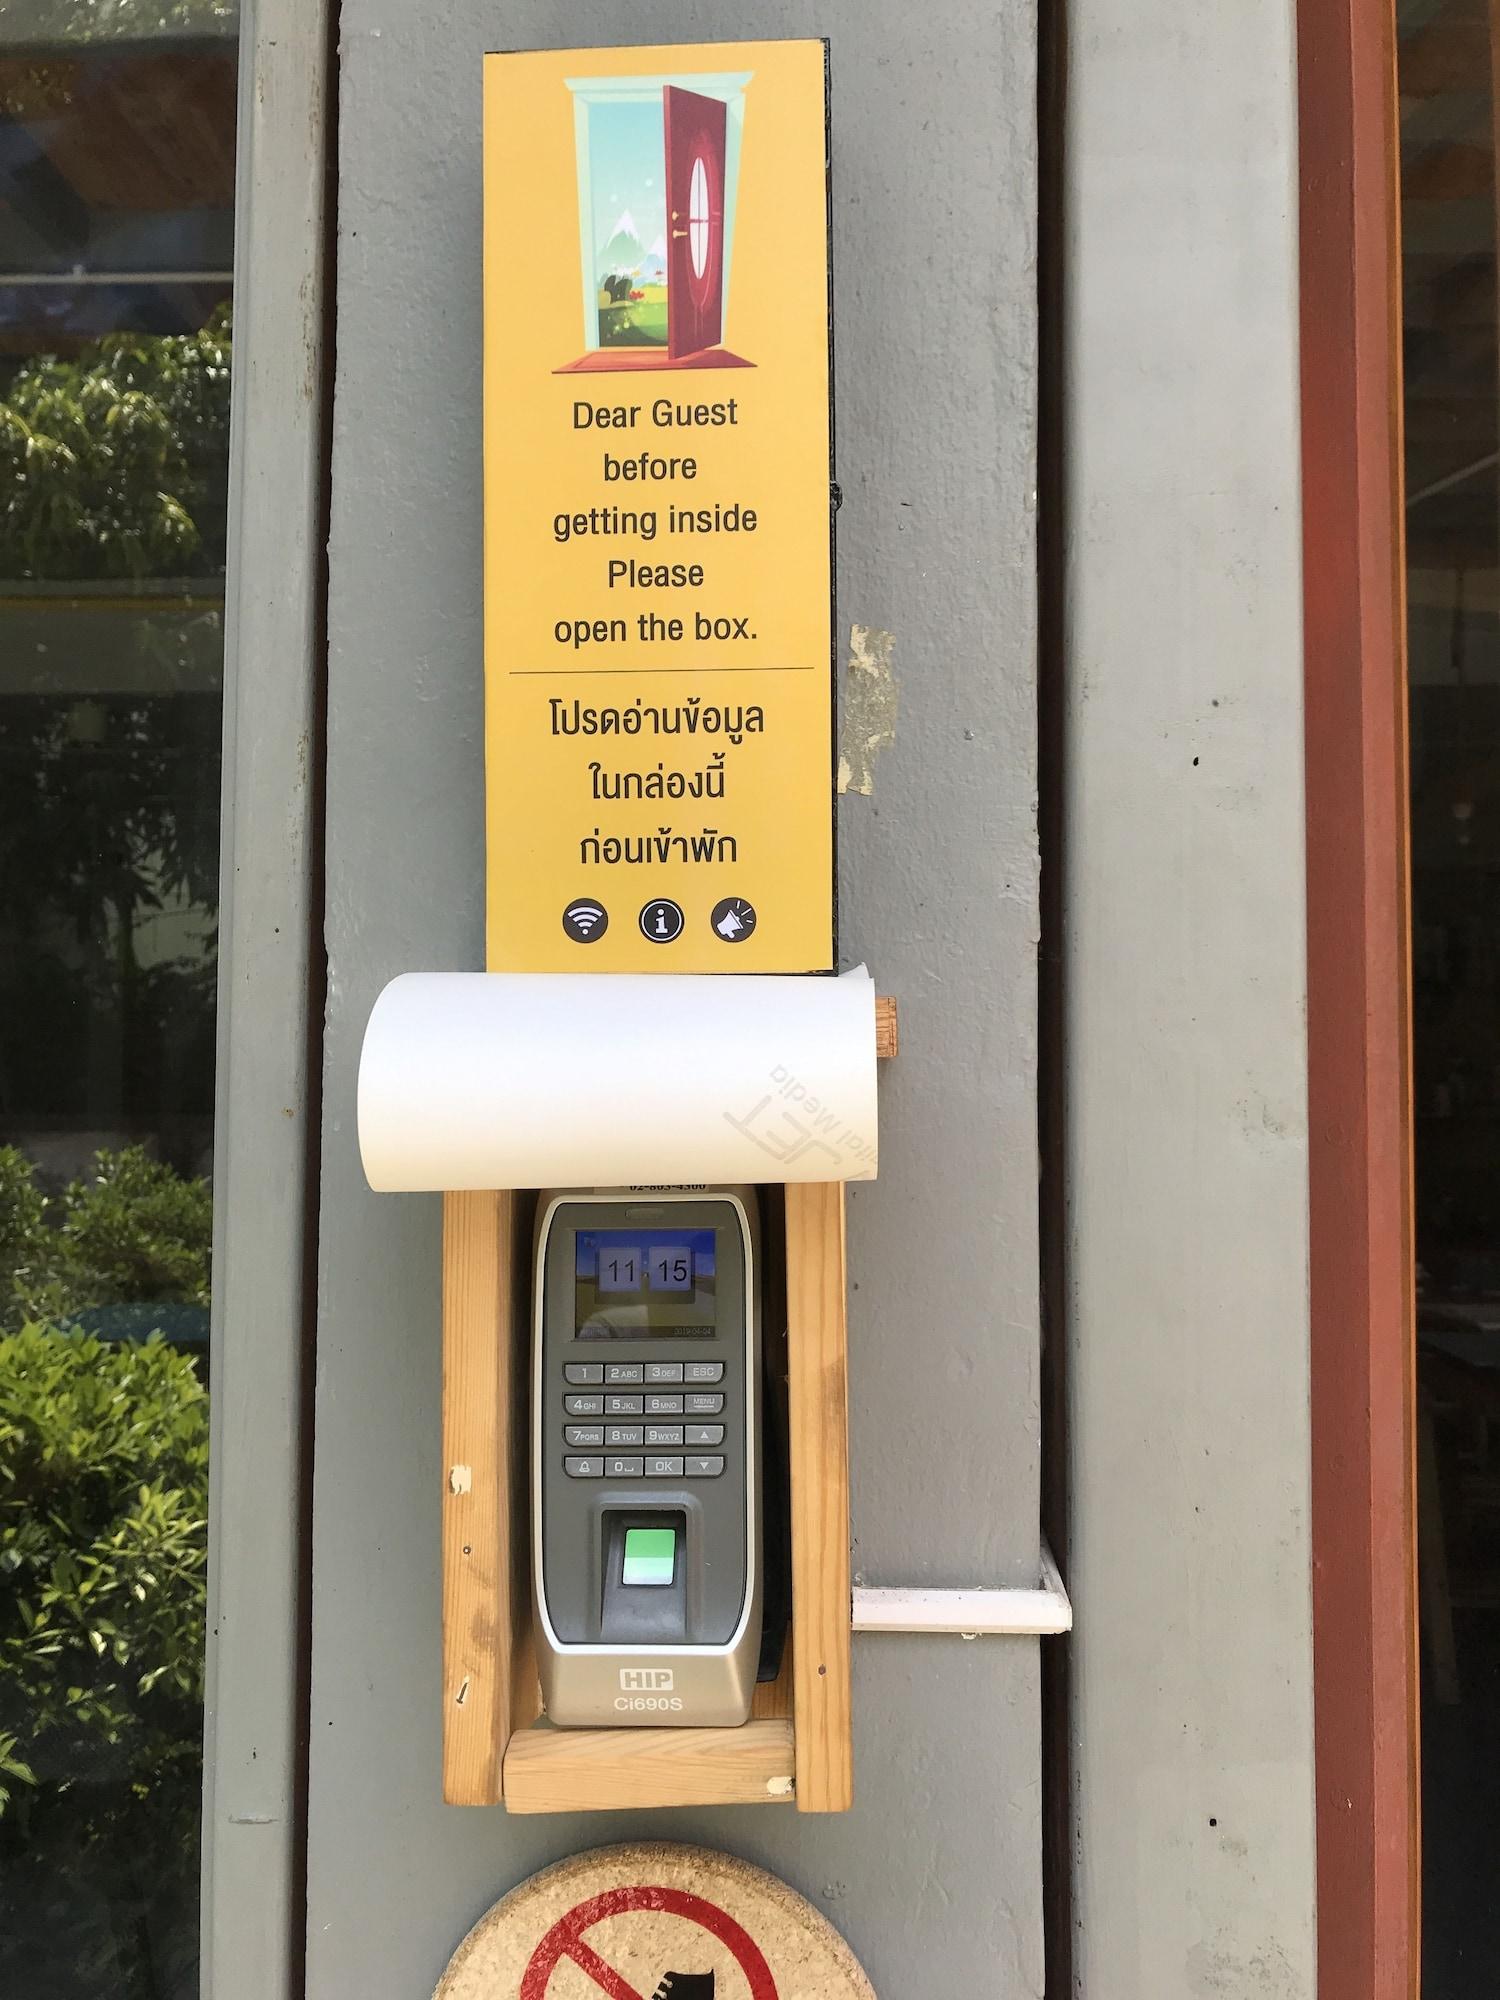 Nesuto Hostel & Cafe Ramkamhaeng 52, Bang Kapi